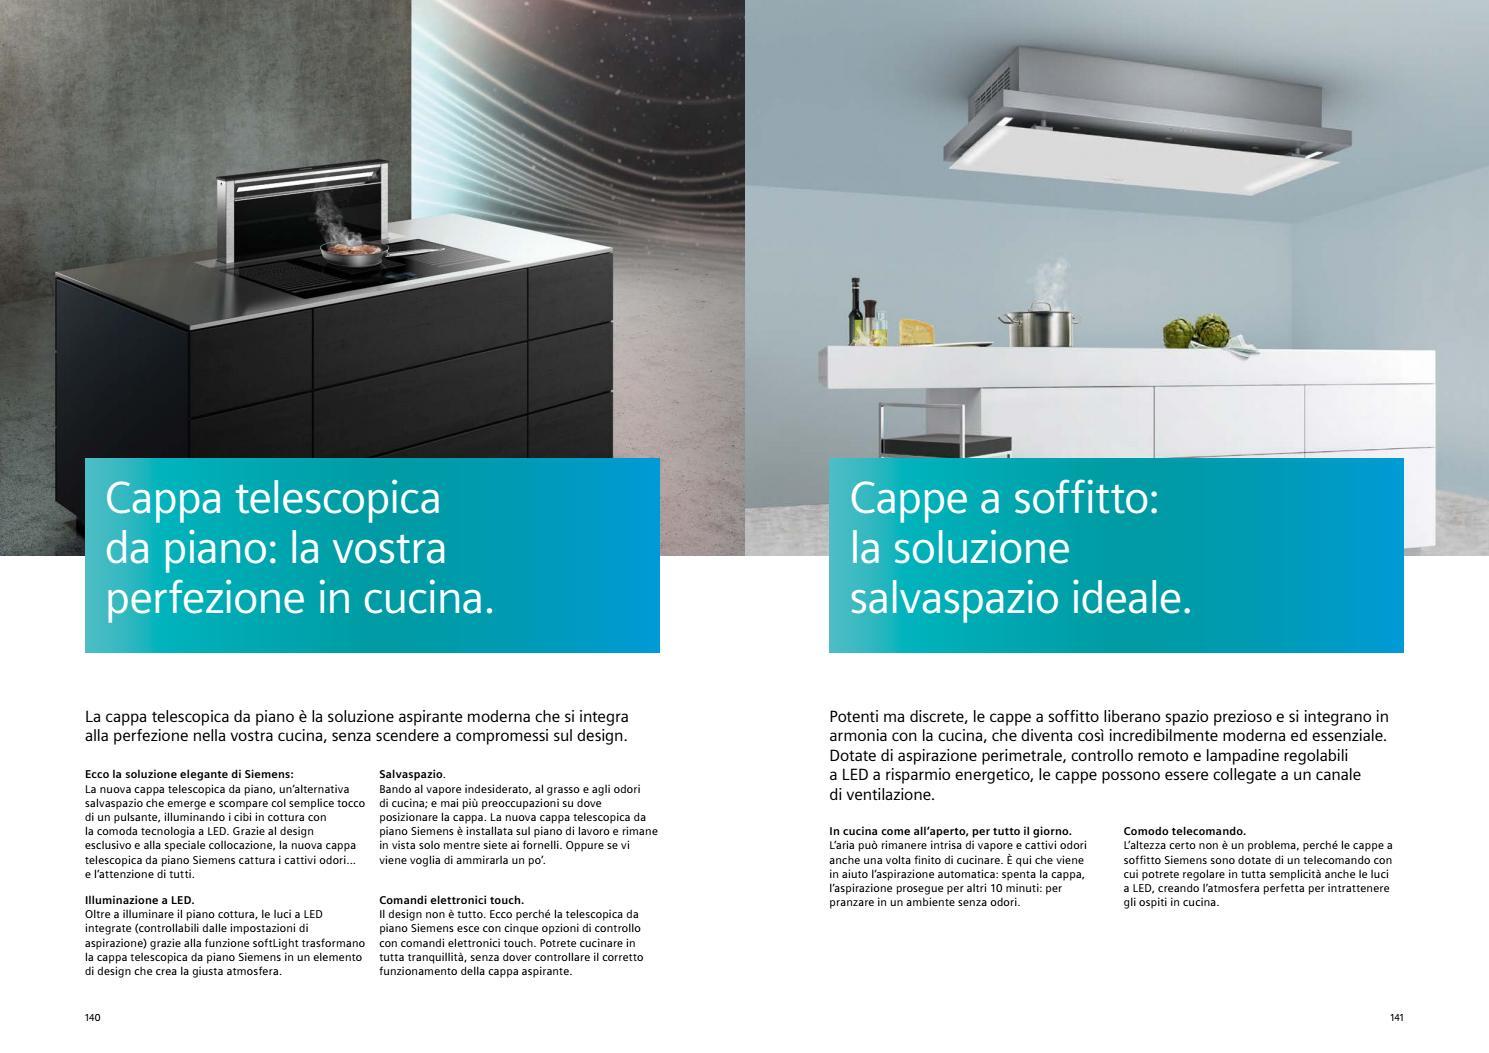 Siemens catalogo arredo 2018 by duegstore.com - issuu